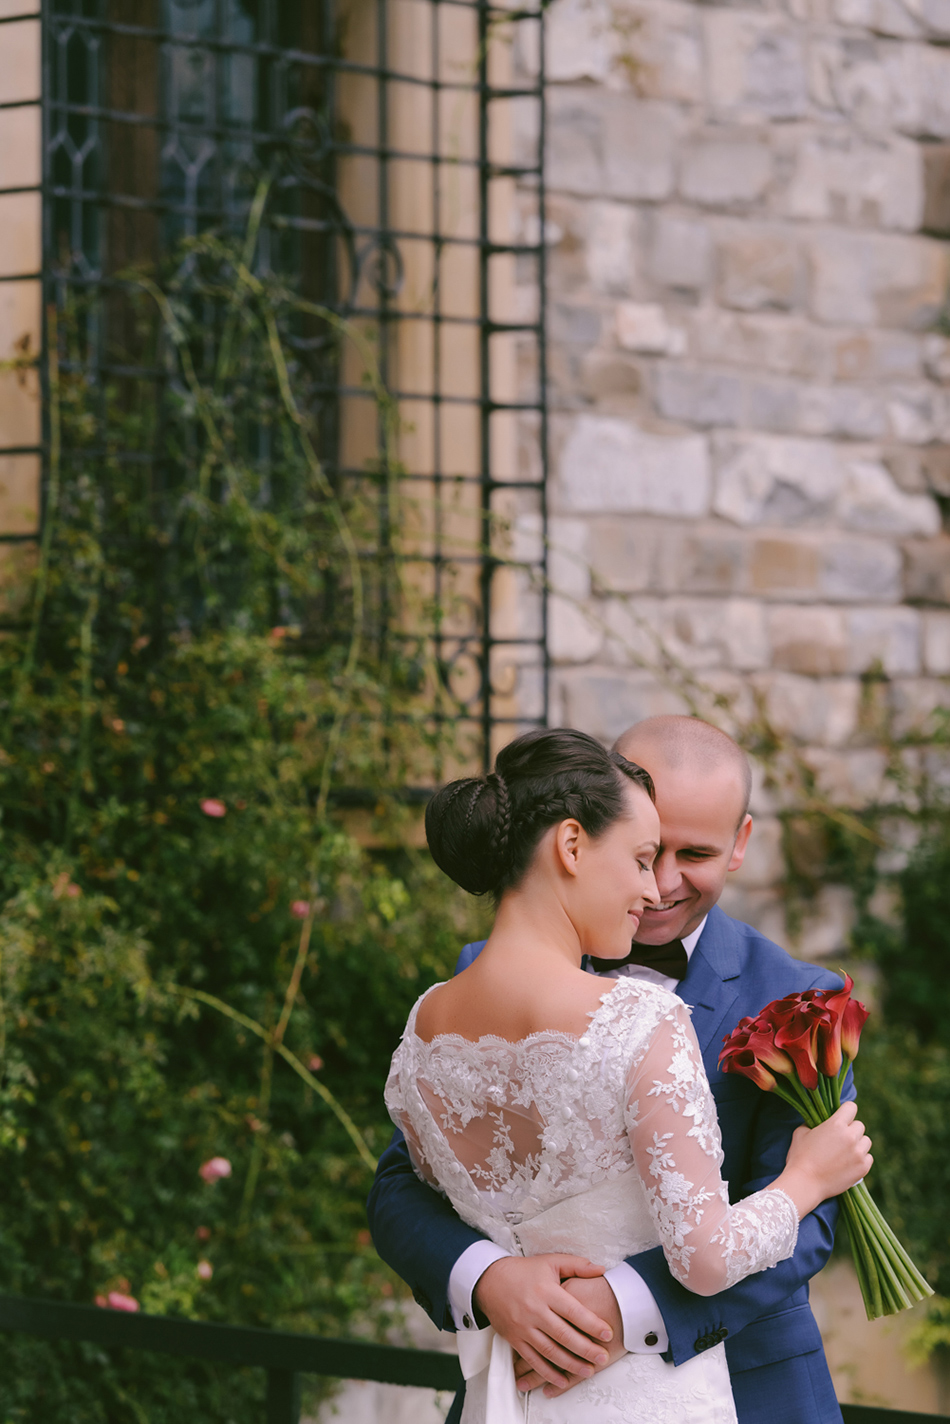 AD Passion Photography | fotograf-nunta-sinaia-flo-oana_0138 | Adelin, Dida, fotograf profesionist, fotograf de nunta, fotografie de nunta, fotograf Timisoara, fotograf Craiova, fotograf Bucuresti, fotograf Arad, nunta Timisoara, nunta Arad, nunta Bucuresti, nunta Craiova